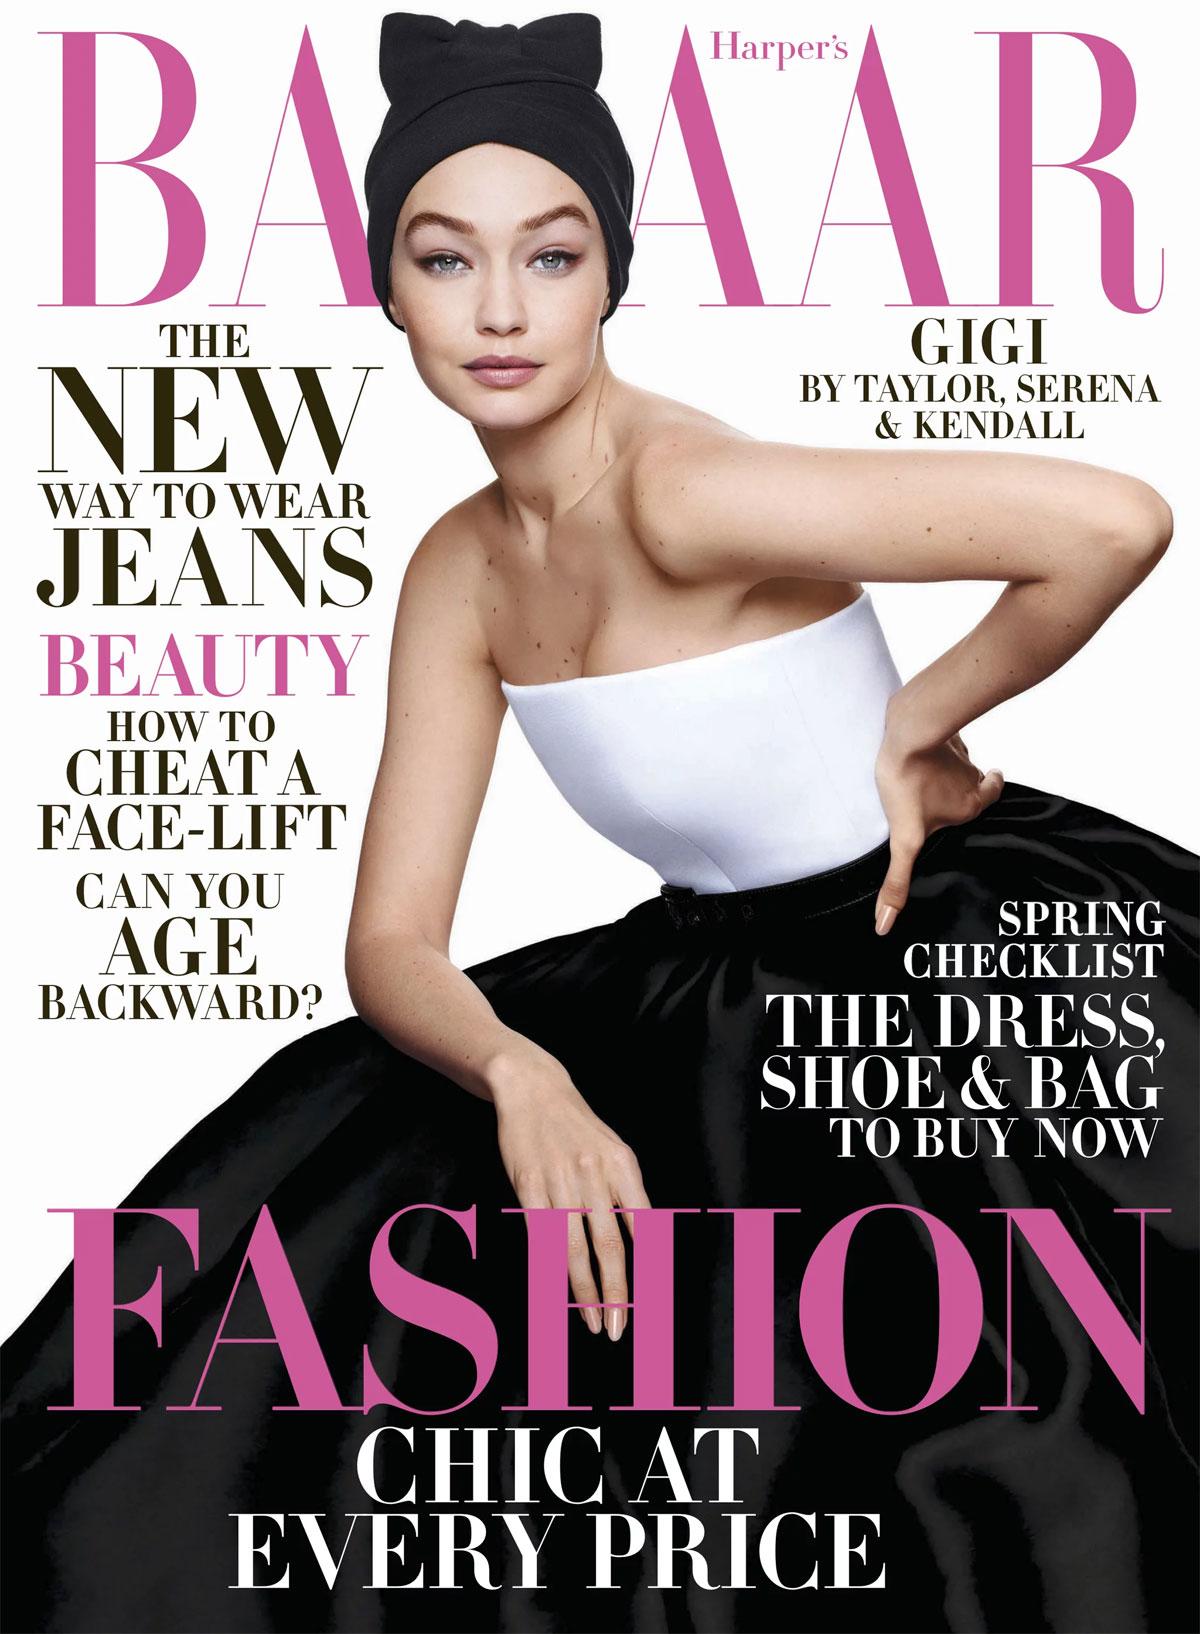 Harper's Bazaar April 2020 Gigi Hadid